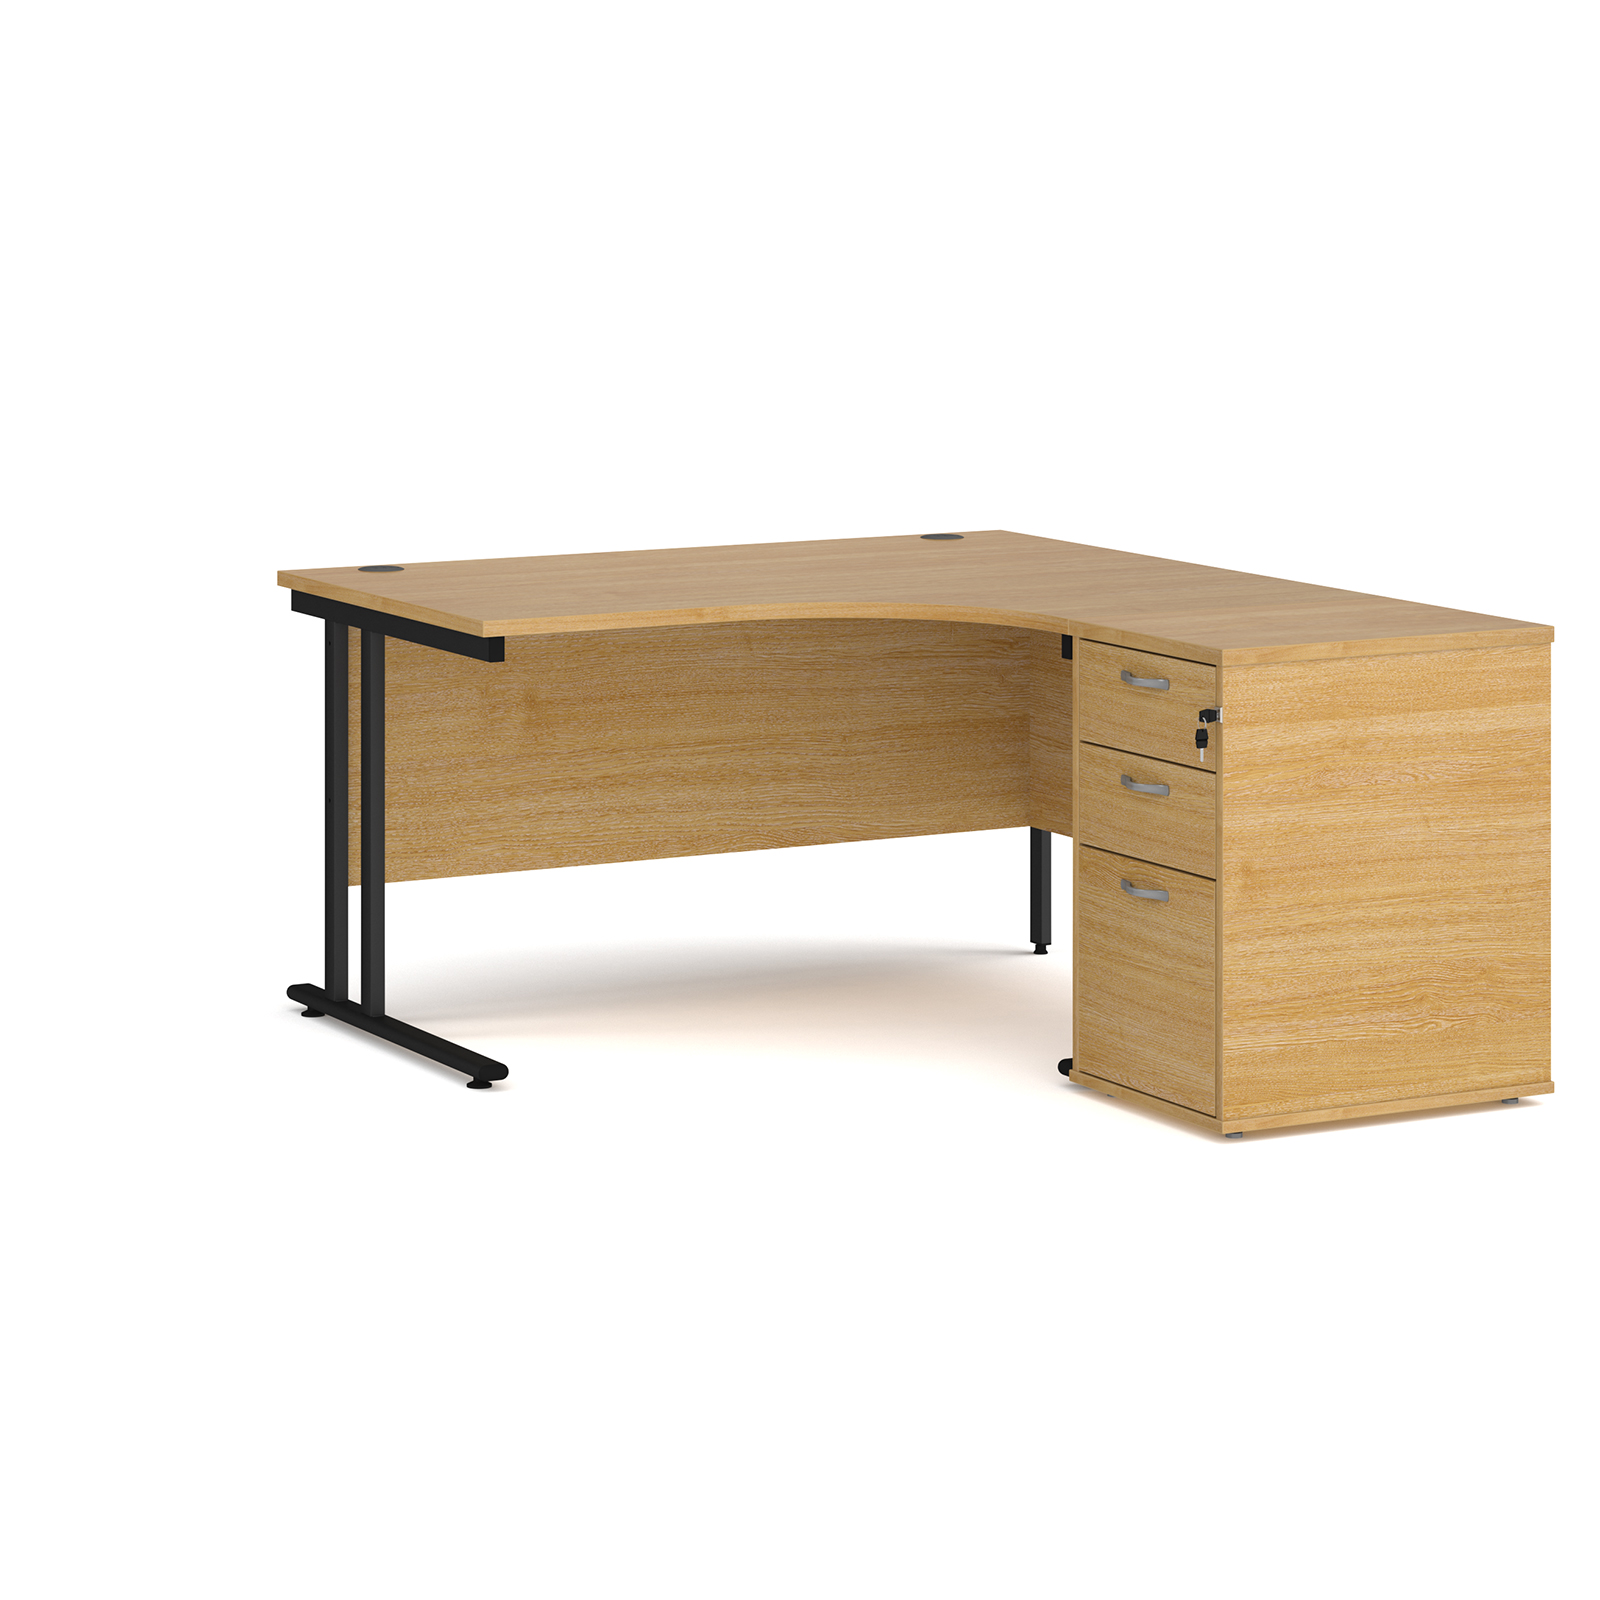 Right Handed Maestro 25 right hand ergonomic desk 1400mm with black cantilever frame and desk high pedestal - oak